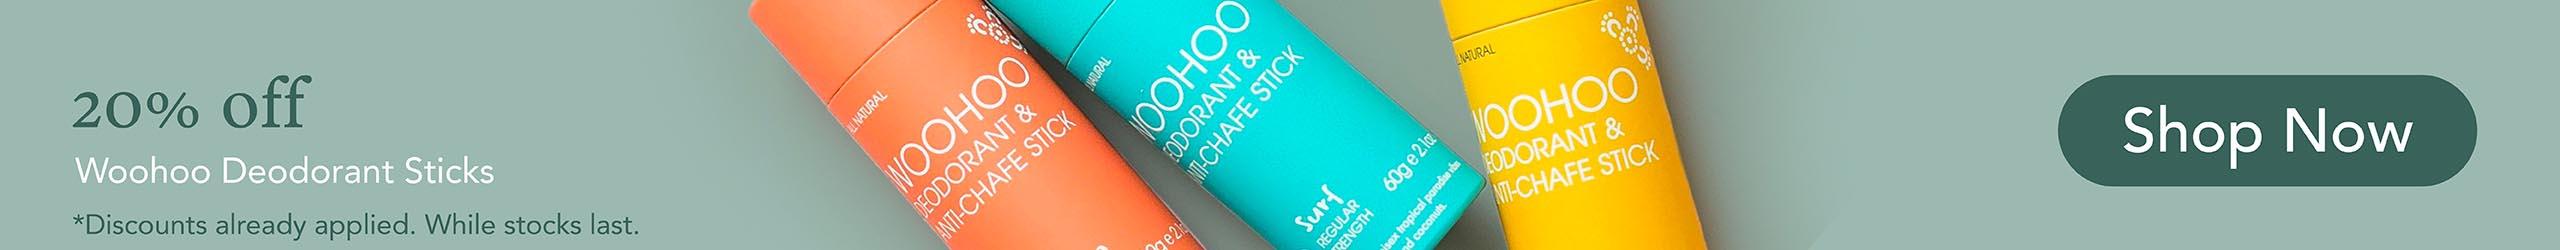 20% off Woohoo Deodorant Sticks